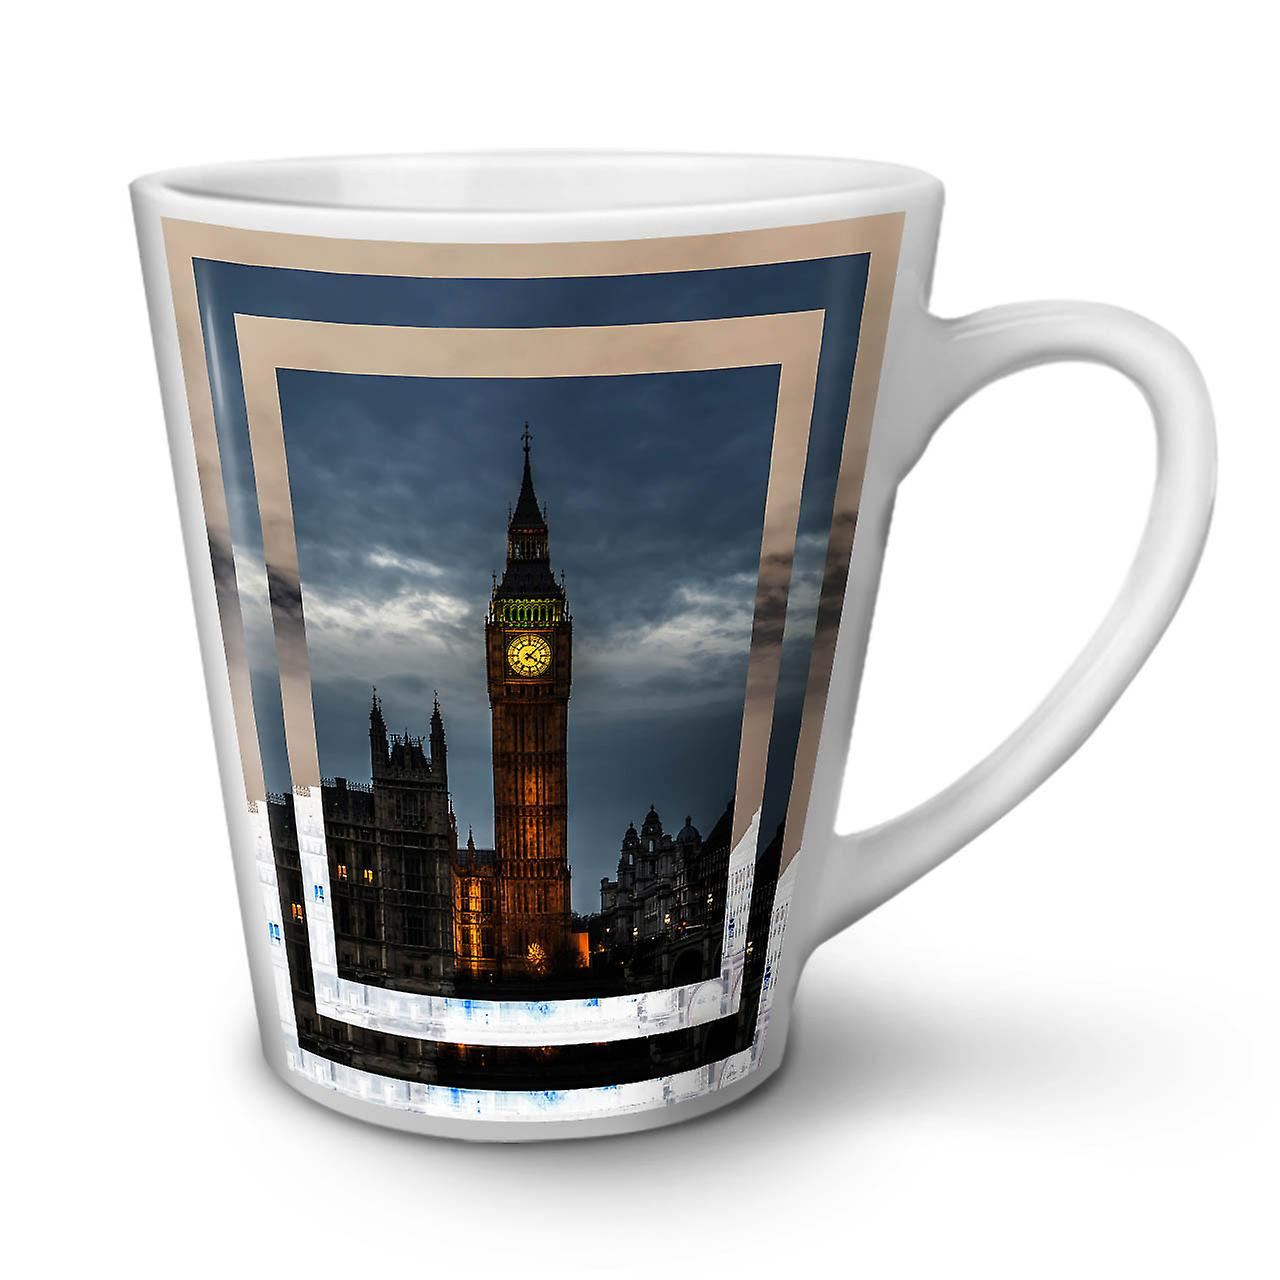 12 Londres Thé Blanc Café Latte Céramique Mug Night OzWellcoda Nouveau En City b6vgmIyY7f